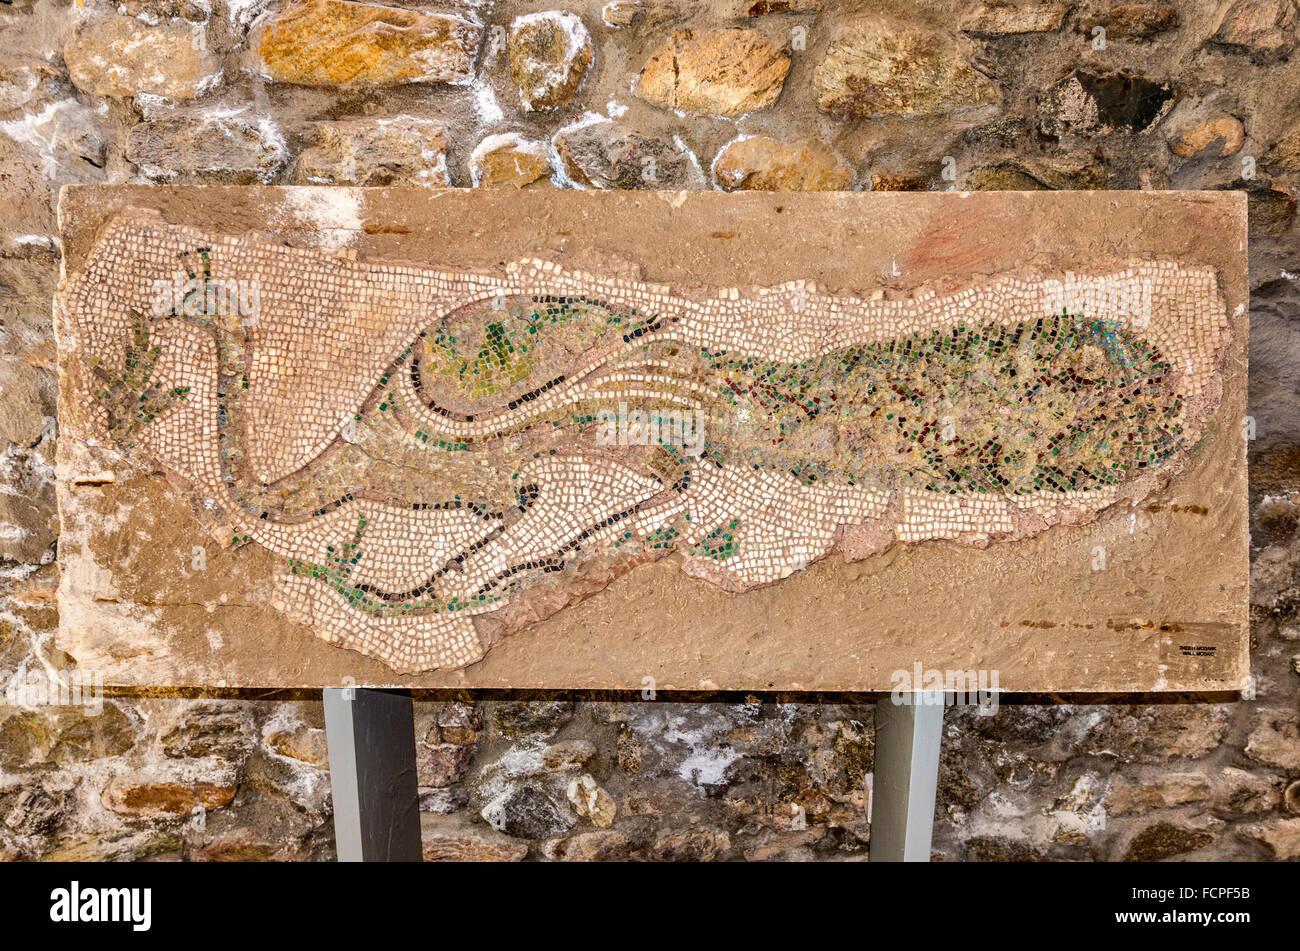 Wall mosaic, museum at Heraclea Lyncestis, ancient Greek and Roman city ruins, near Bitola, Republic of North Macedonia - Stock Image